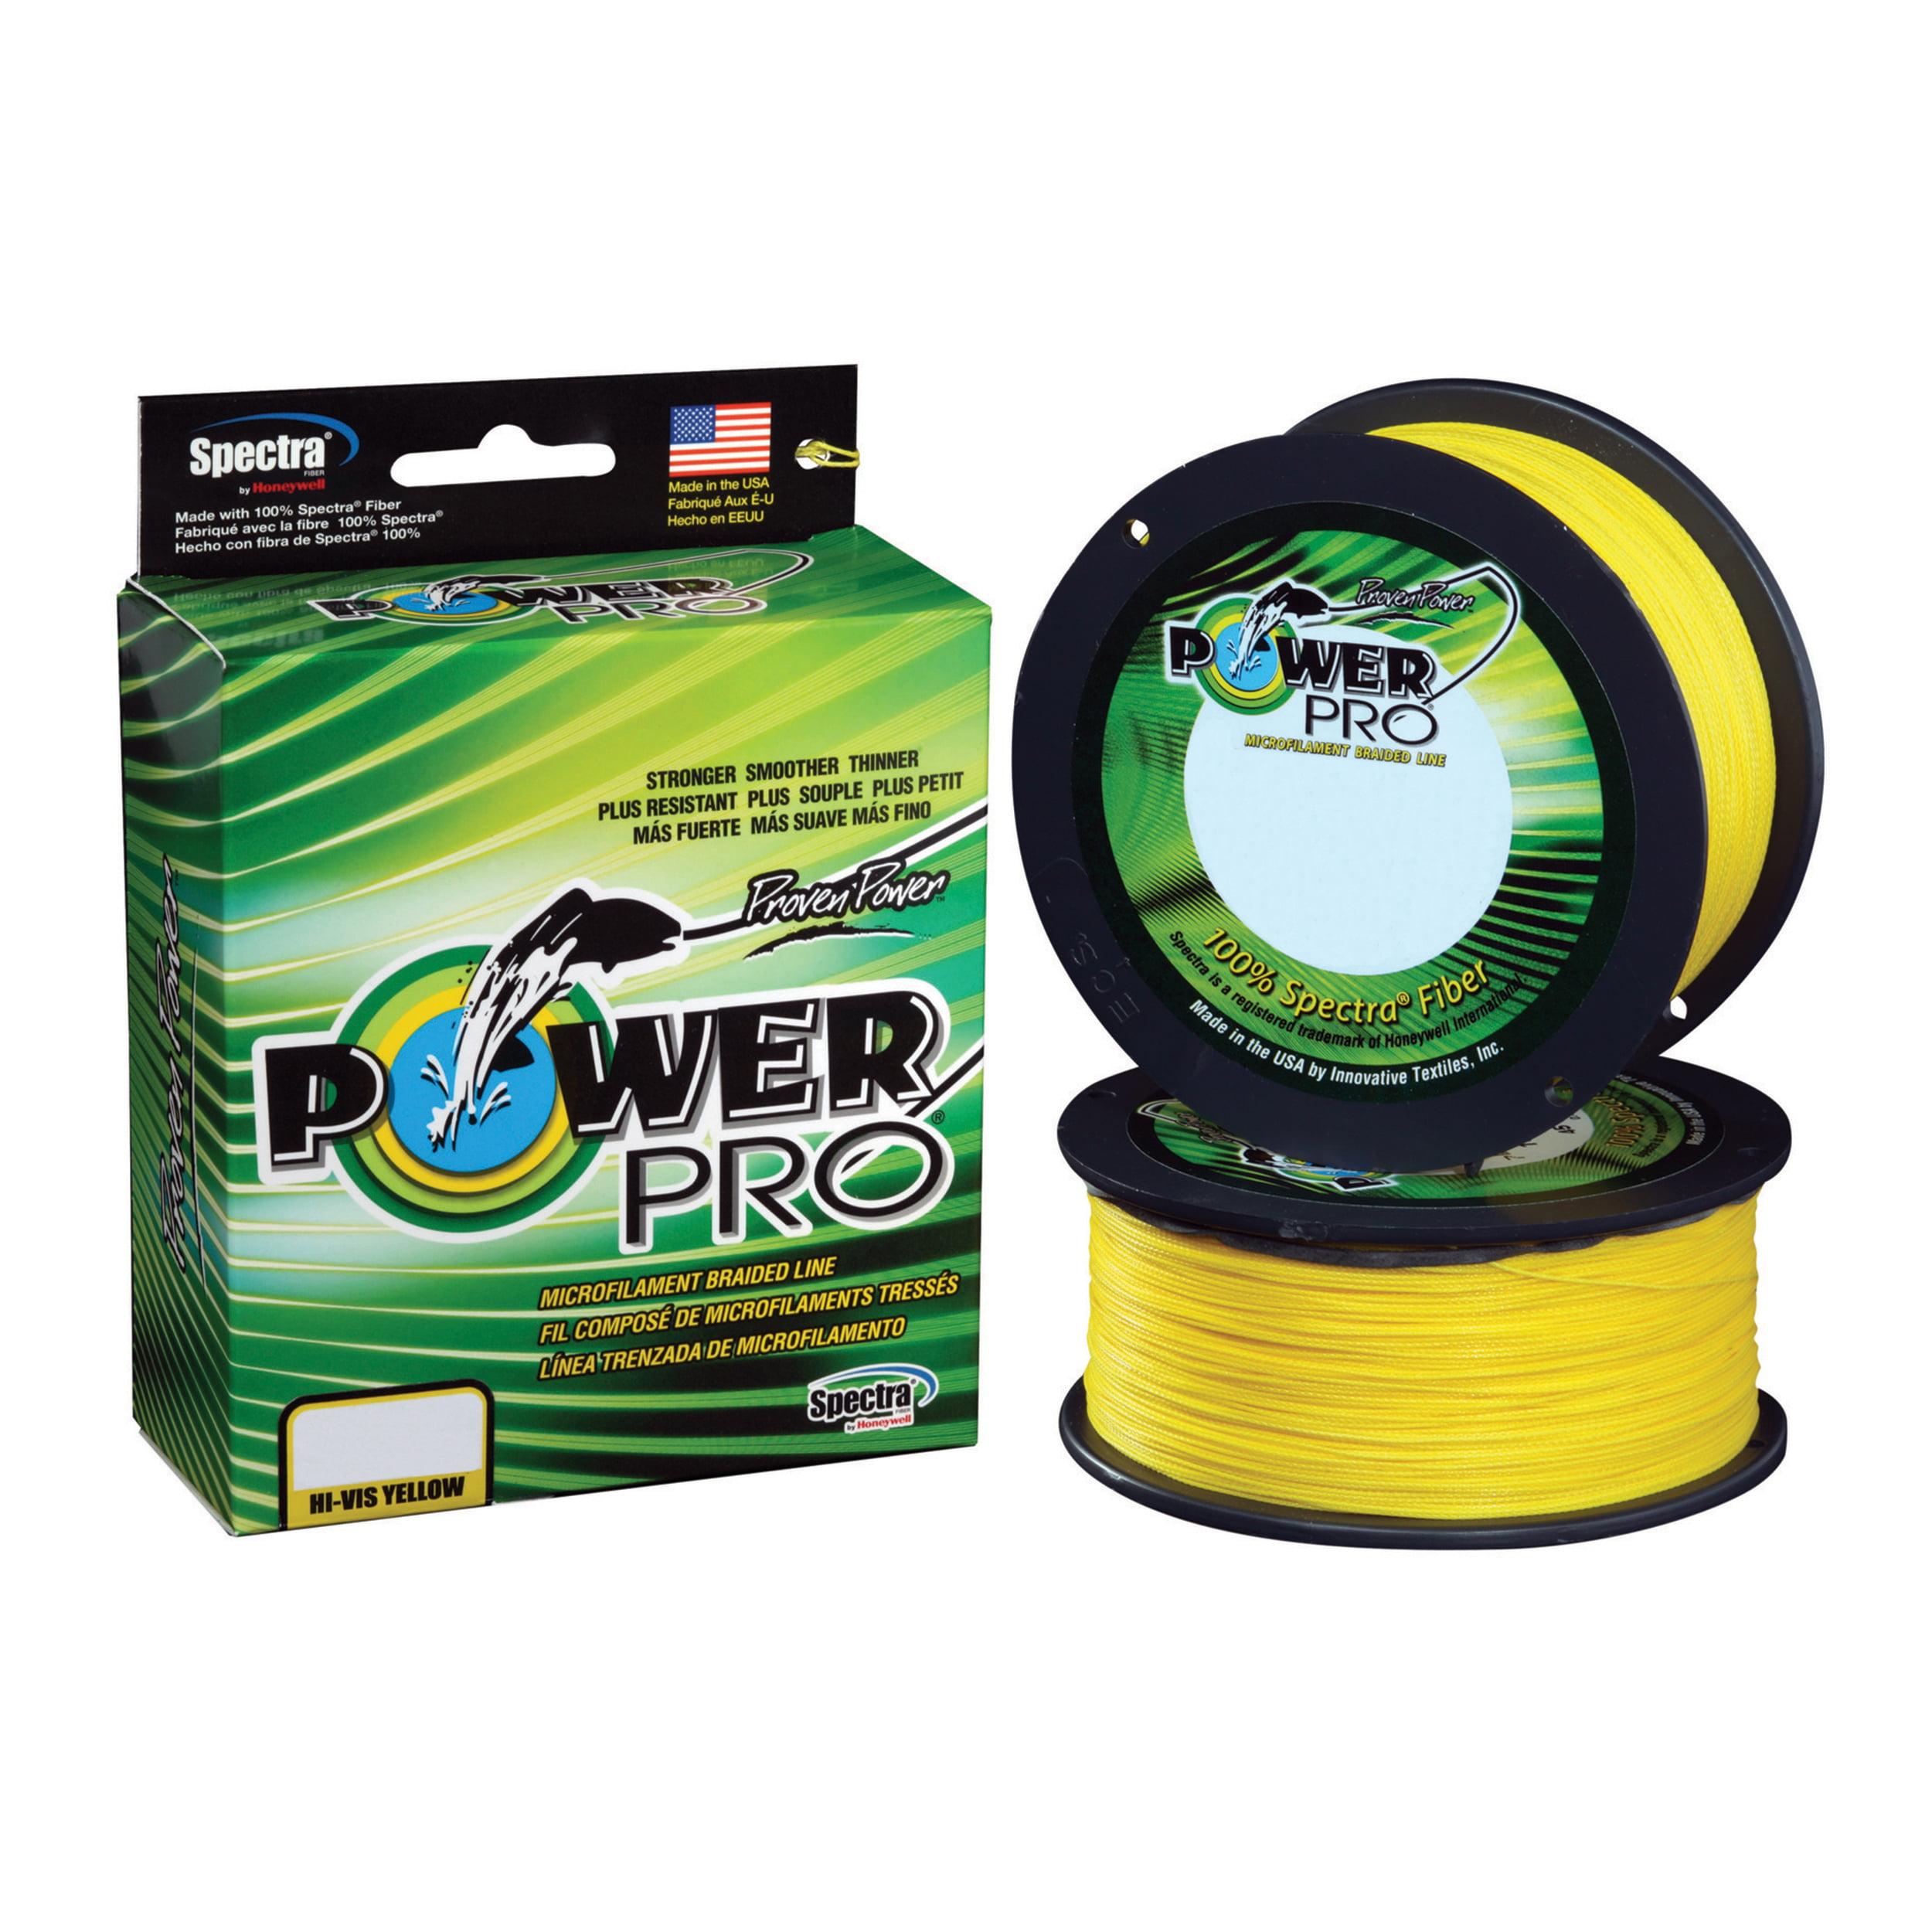 "Shimano PowerPro Braided Line 300 Yards. 8 lbs Tested, 0.005"" Diameter, Hi-Vis Yellow"